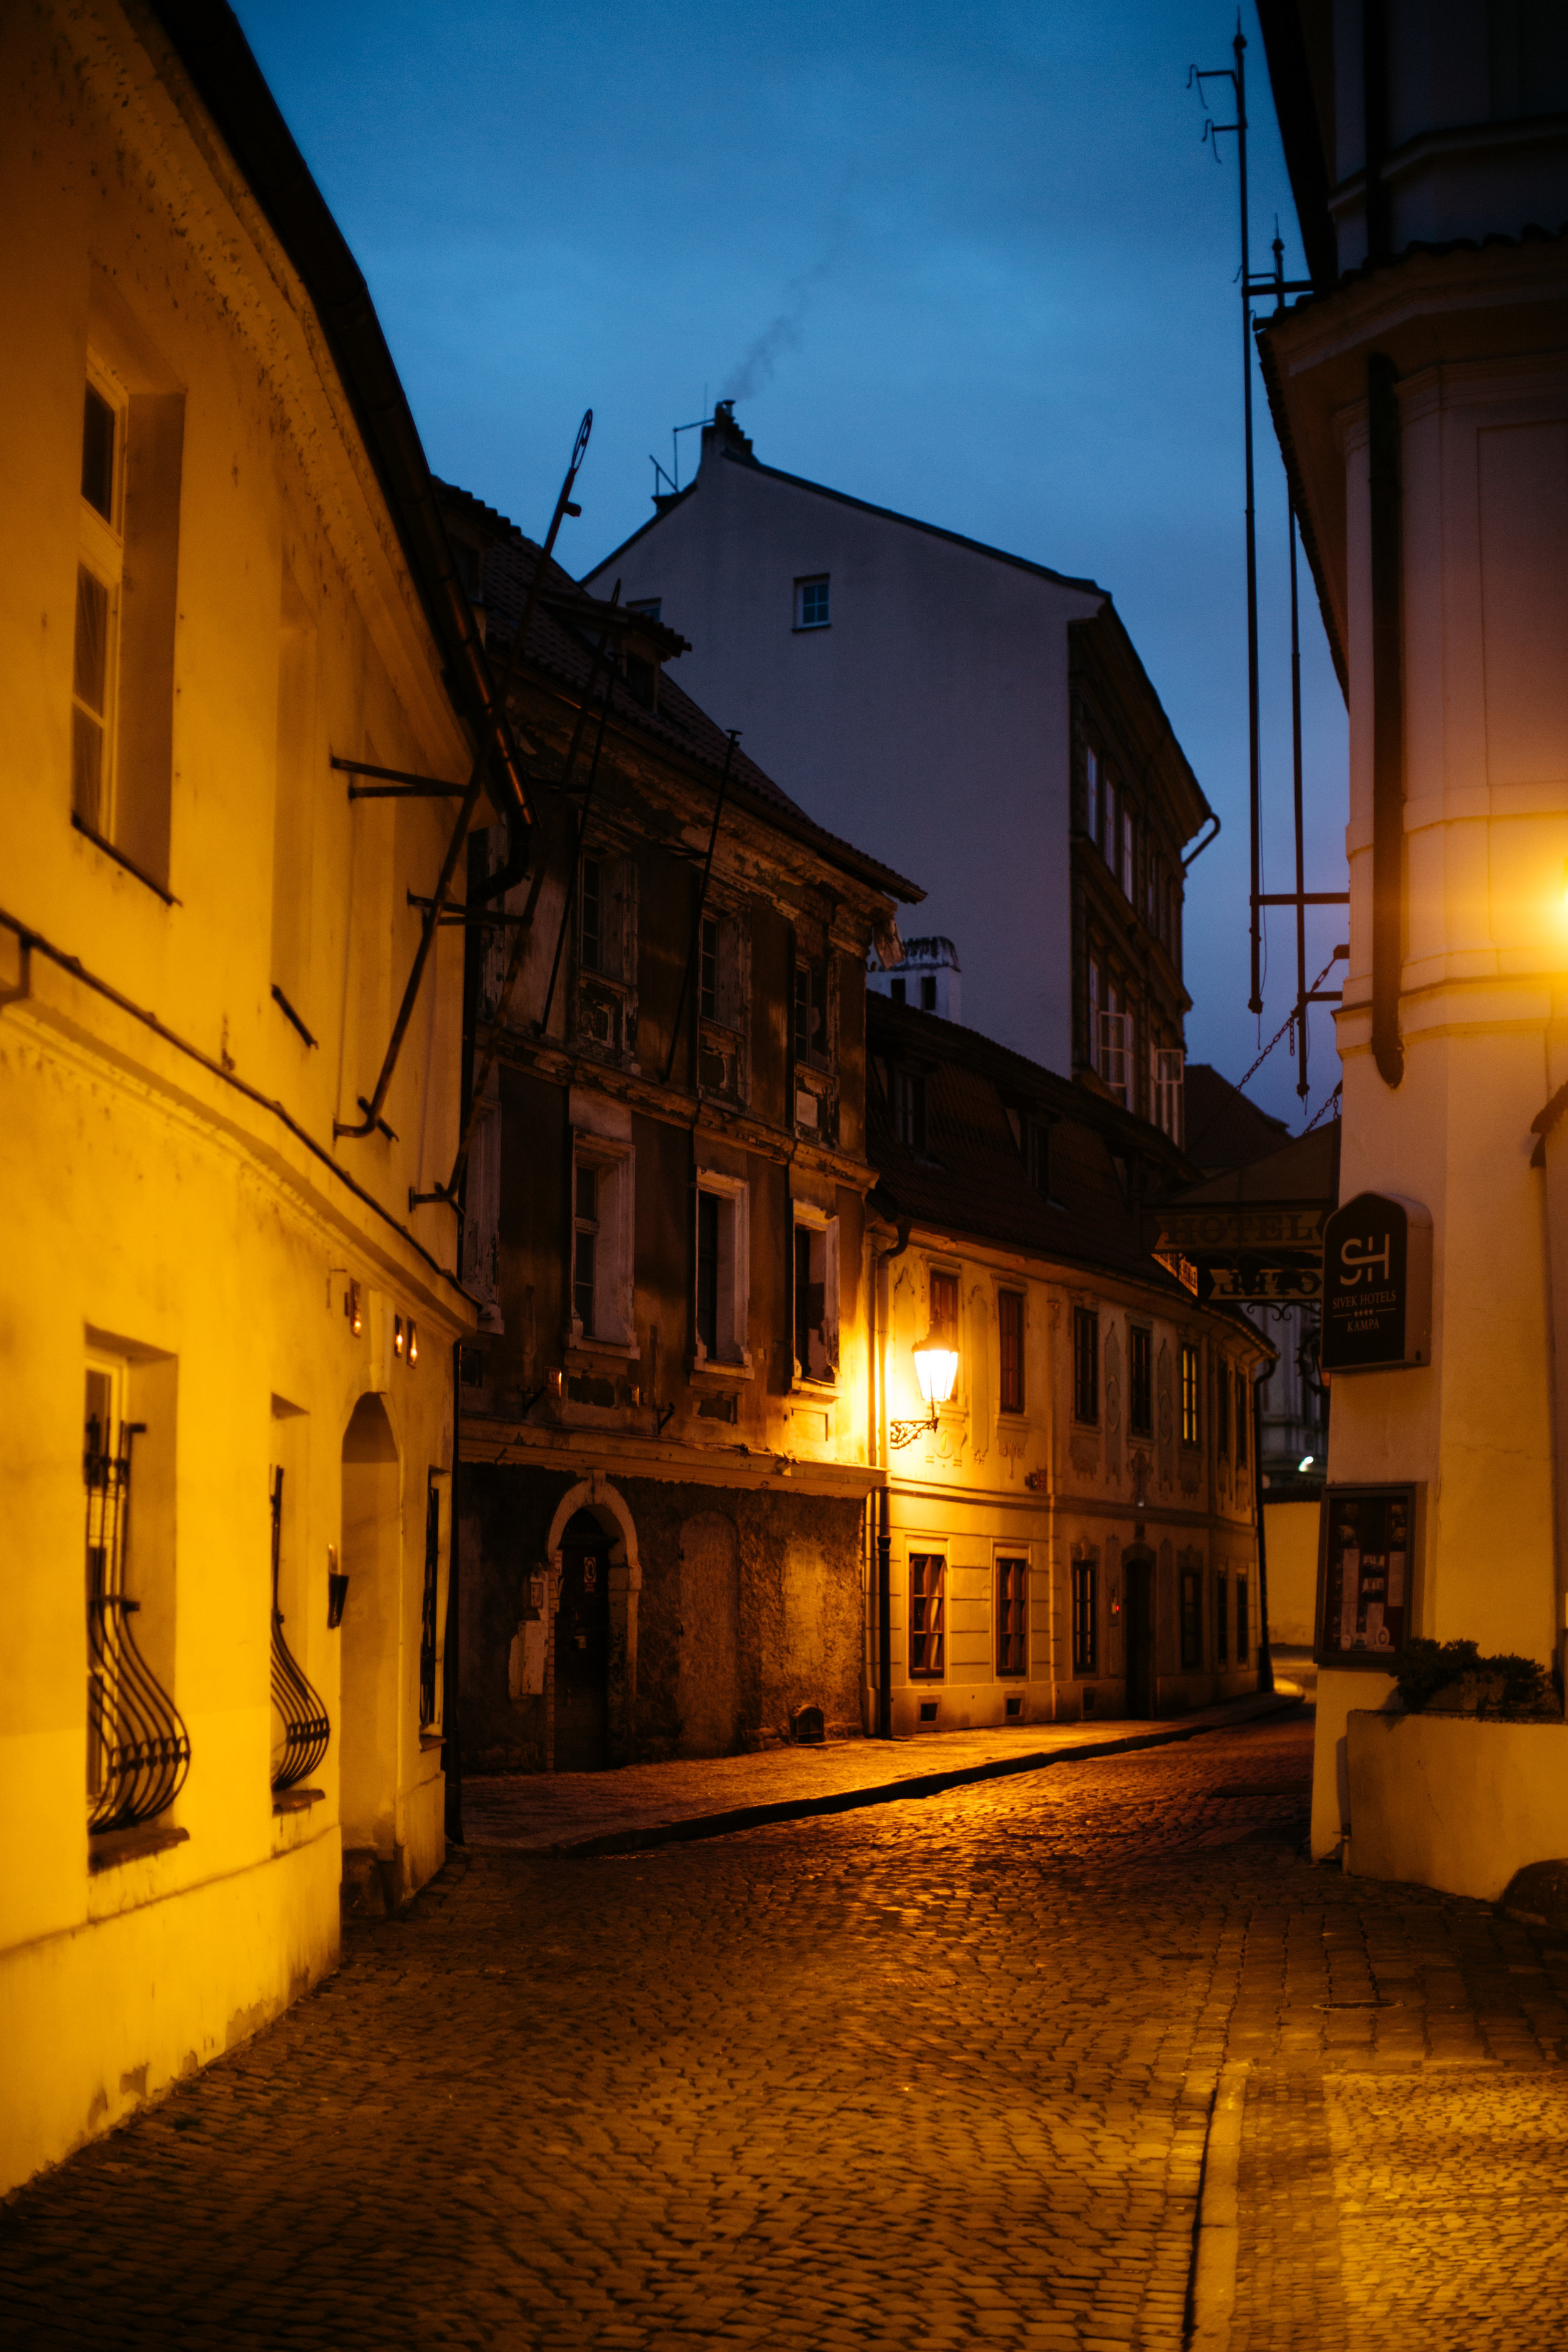 Evening walks on Czech cobblestone pathways...